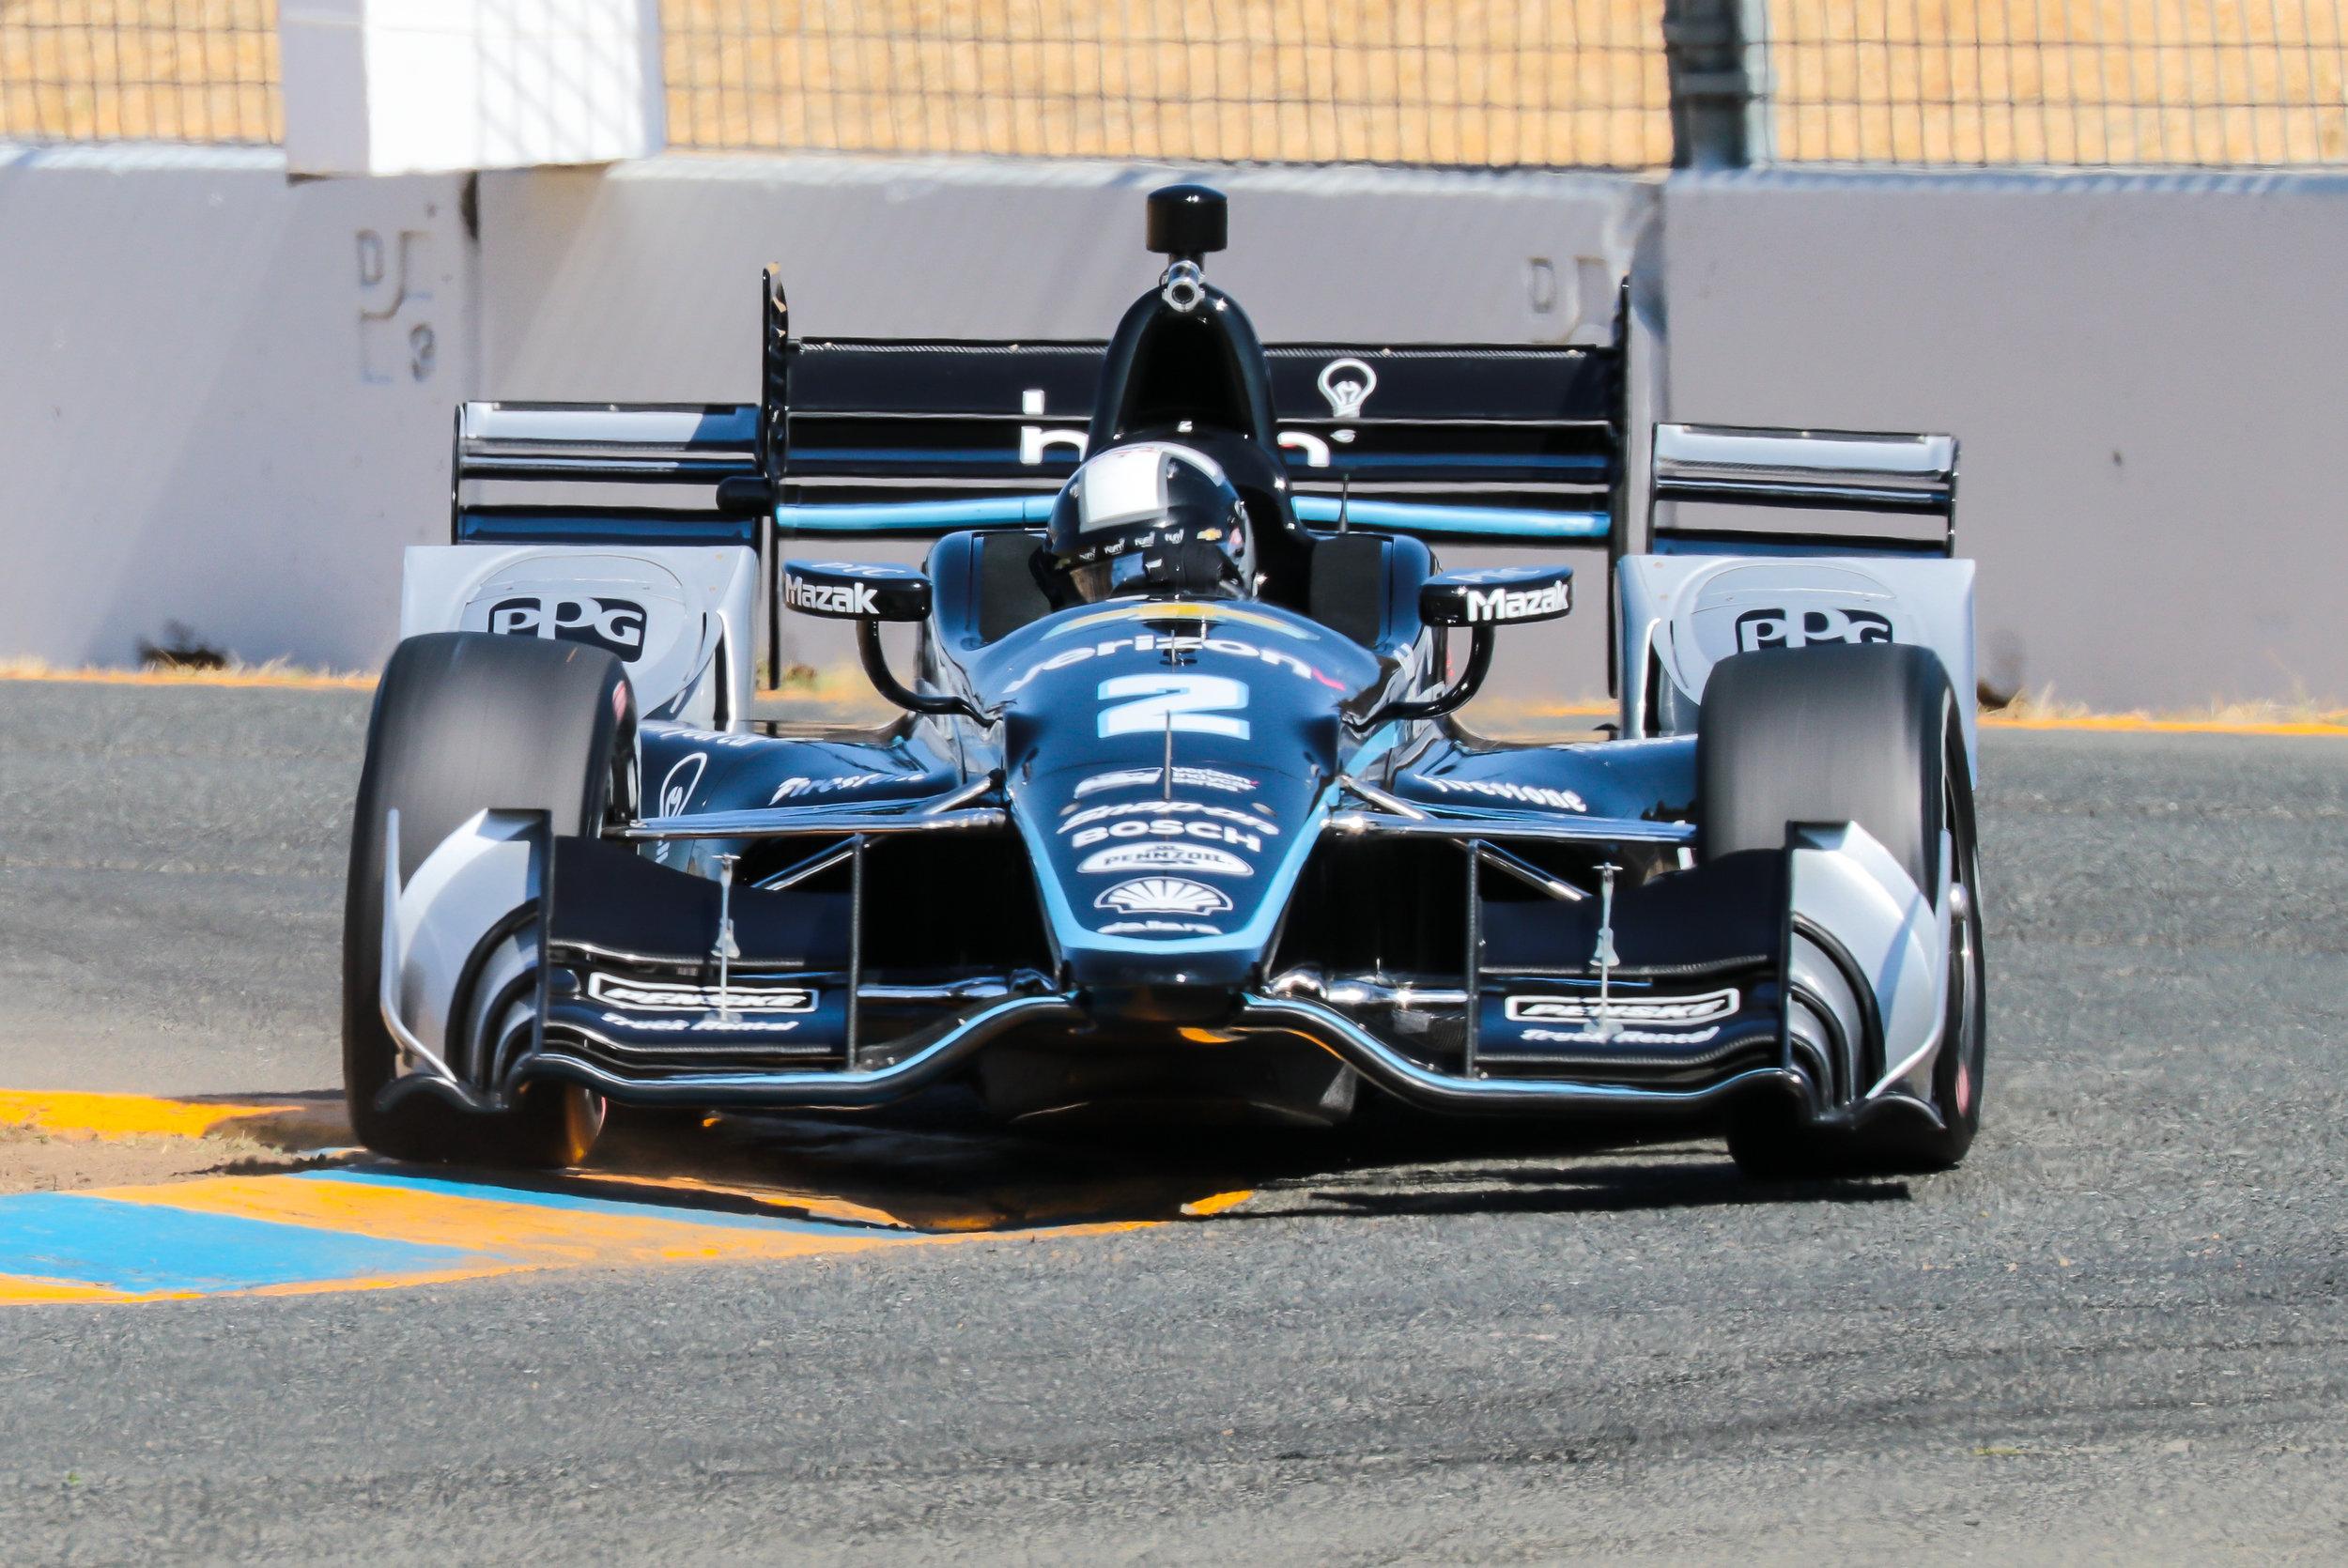 Indy16-2019.jpg